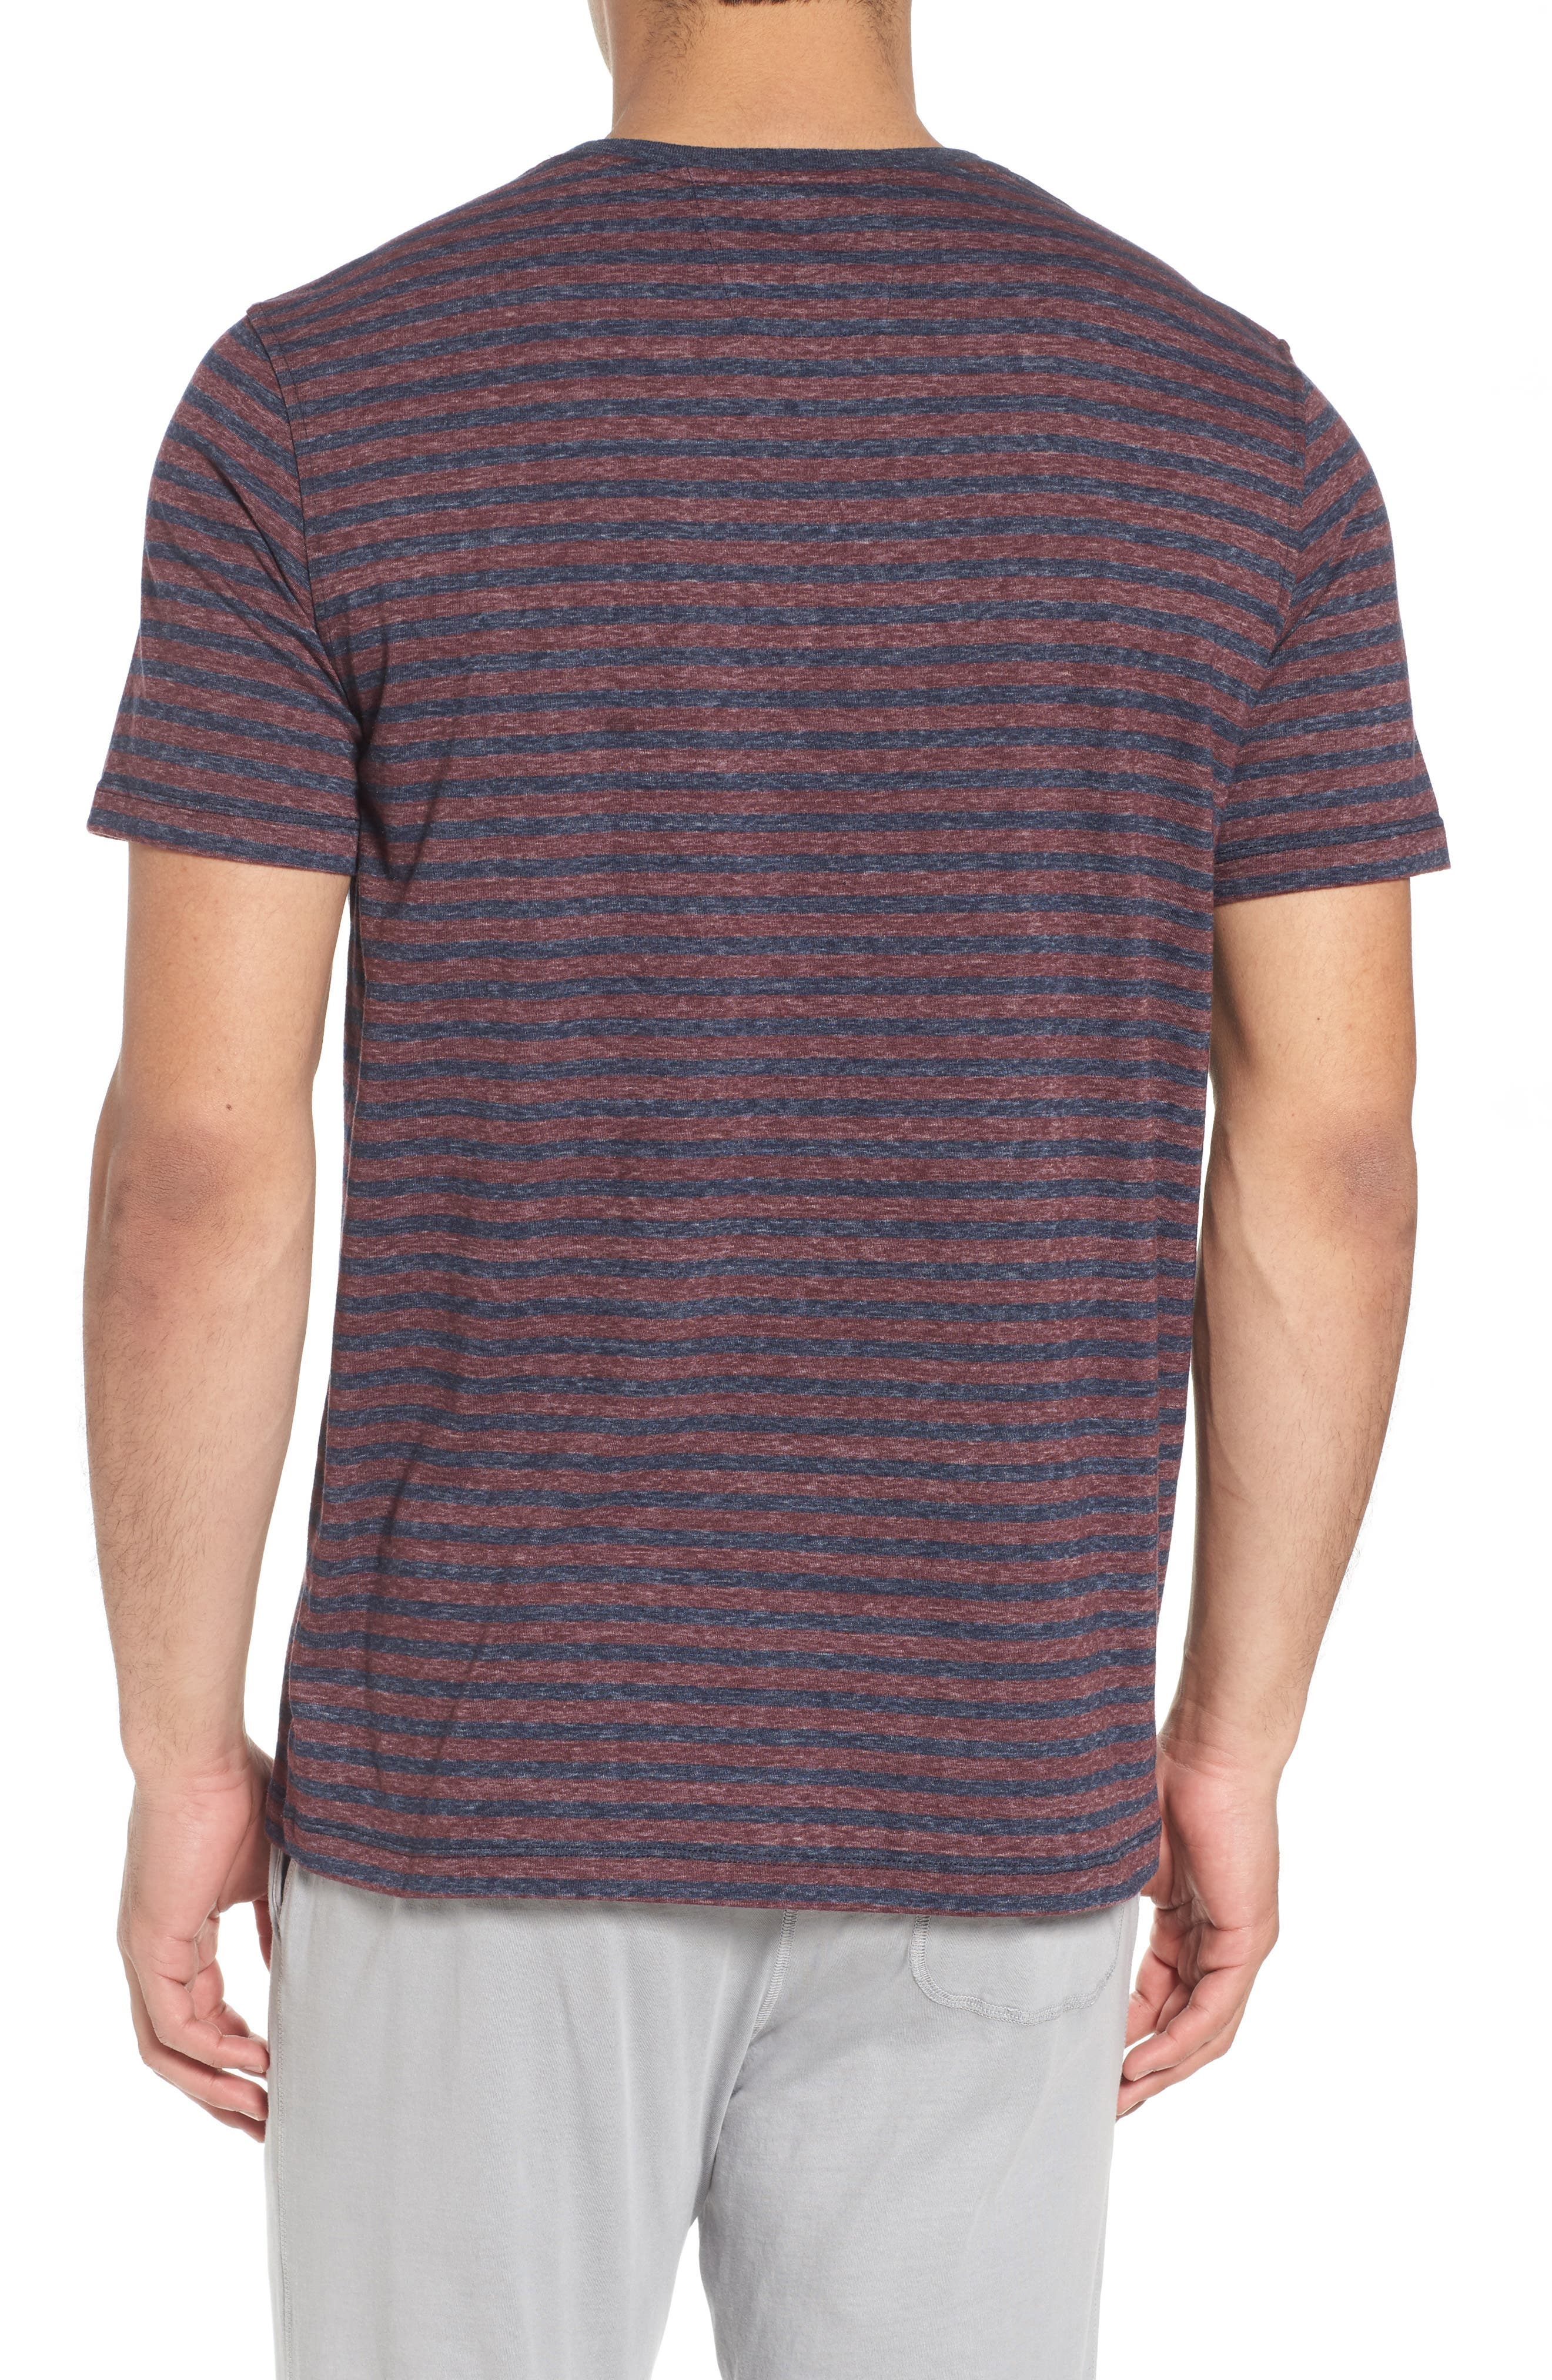 Crewneck Recycled Cotton Blend T-Shirt,                             Alternate thumbnail 2, color,                             482